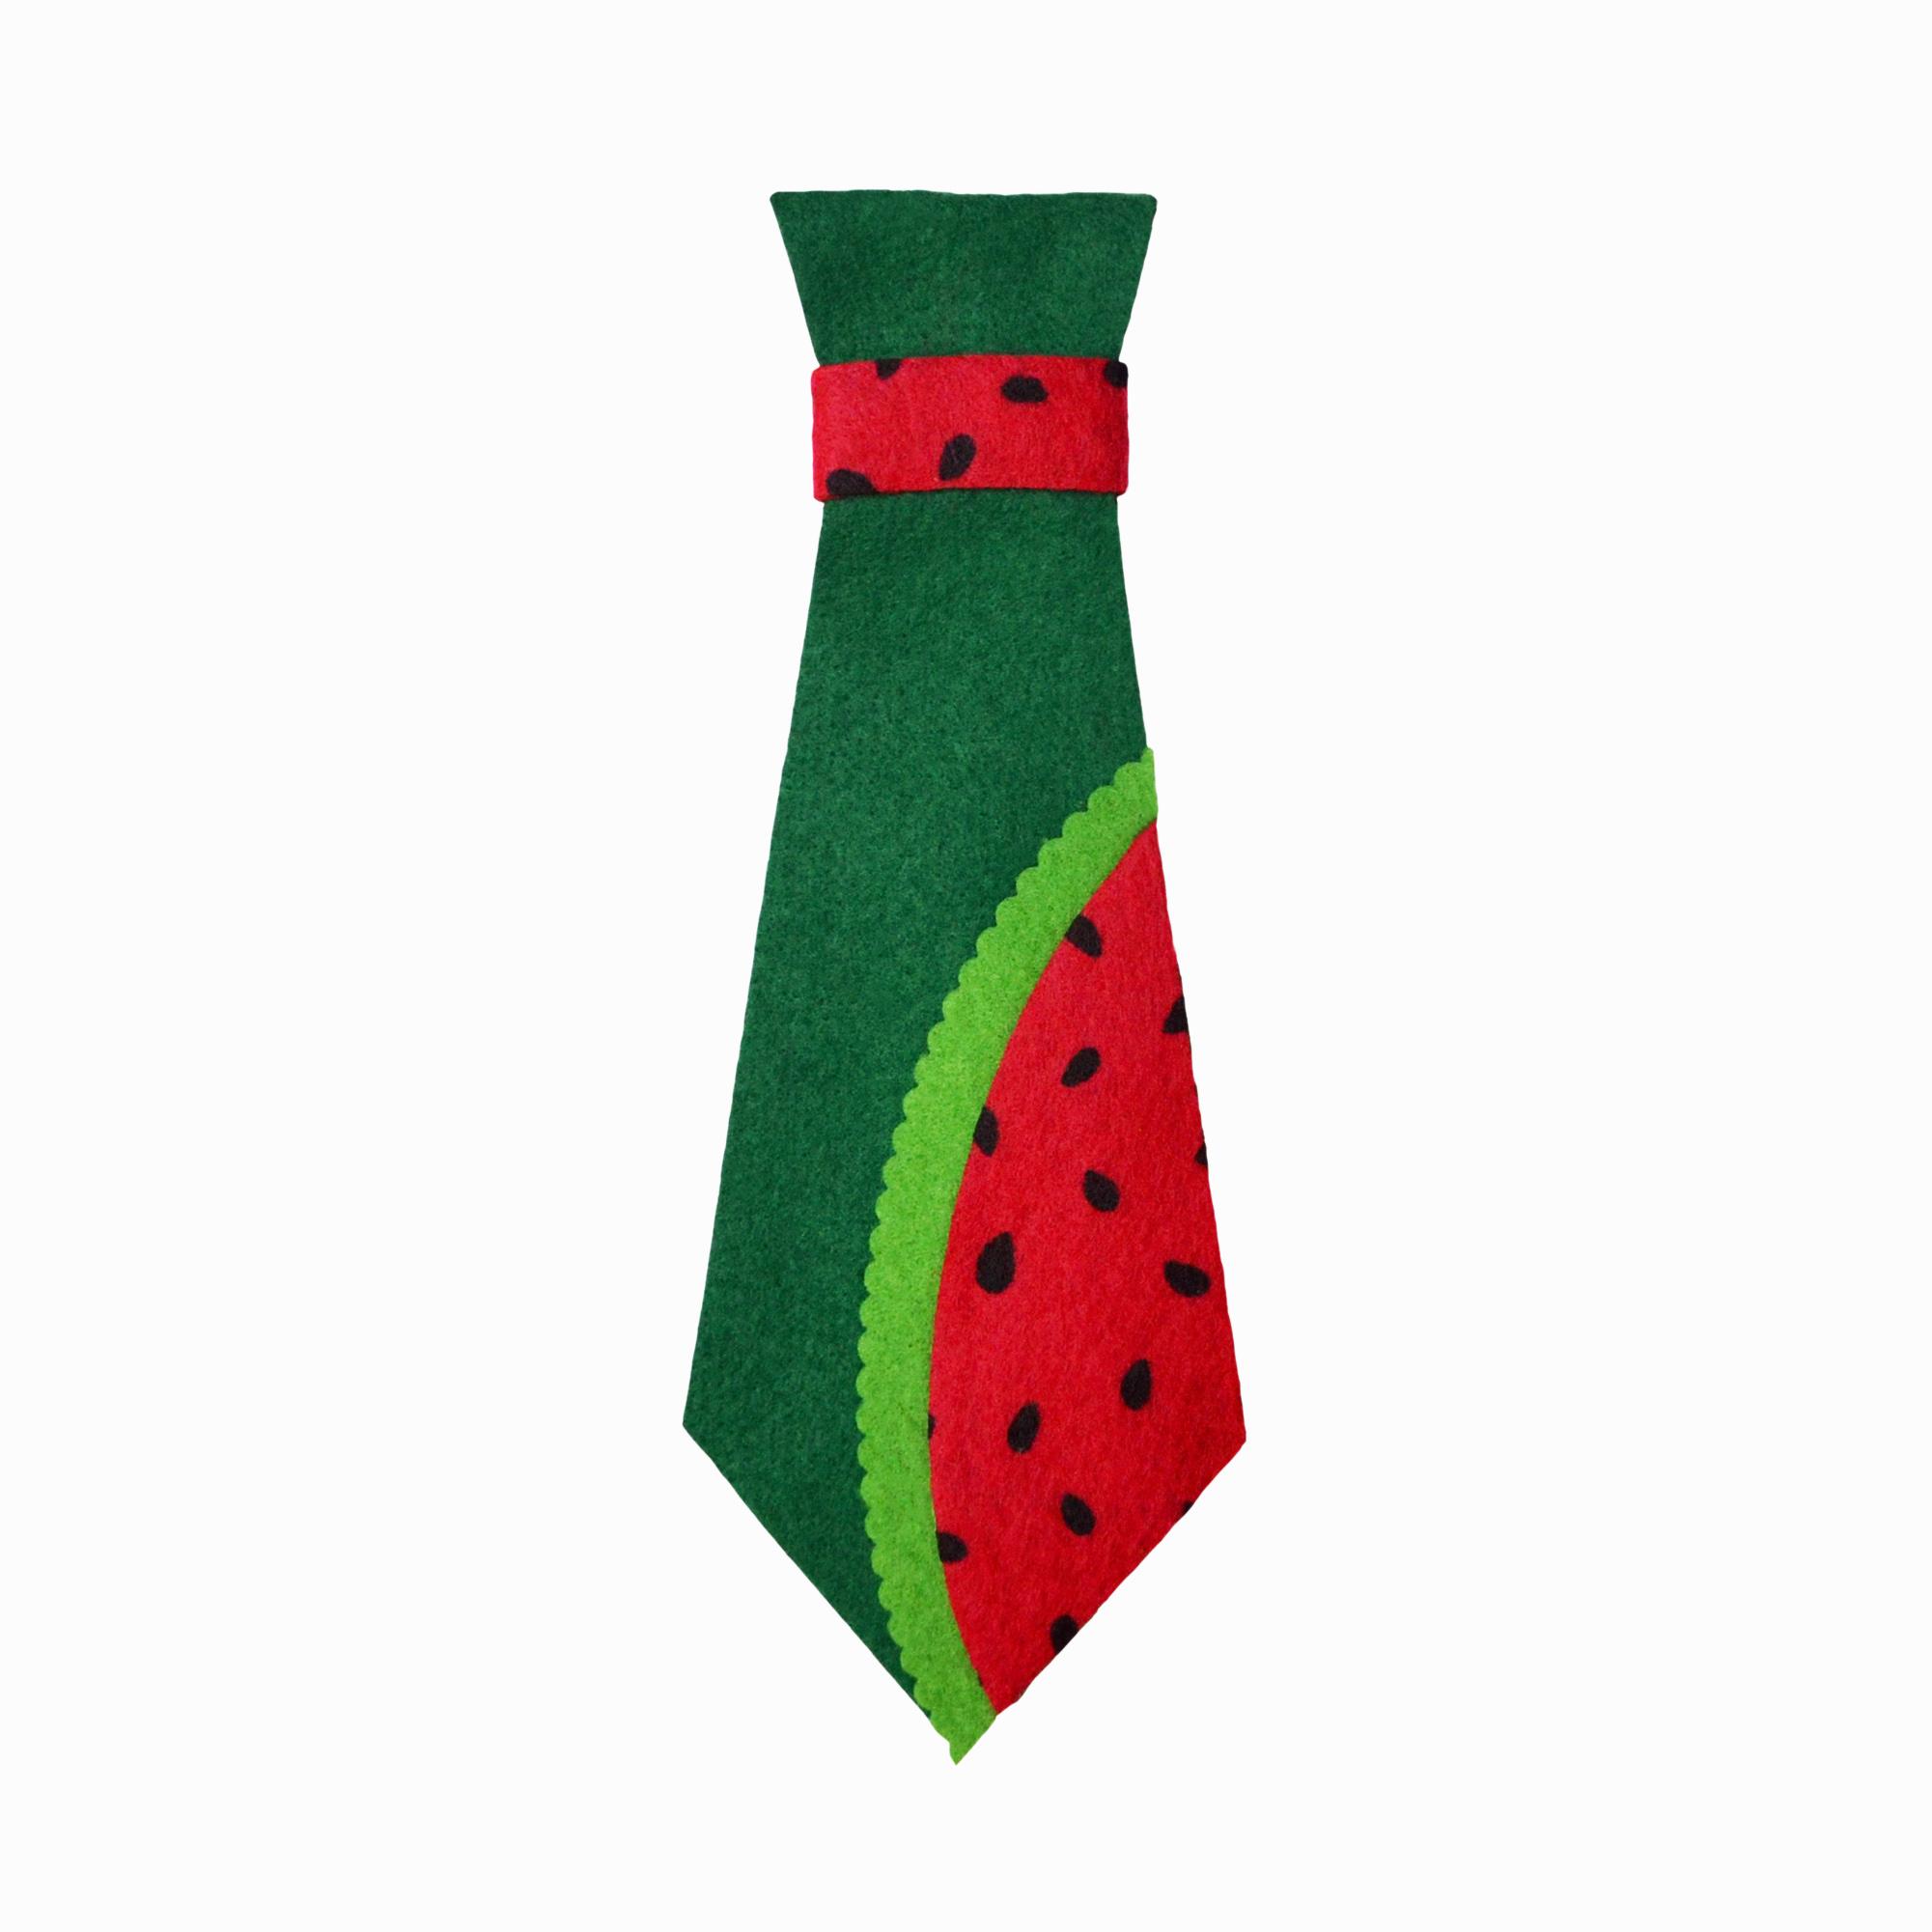 کراوات پسرانه مدل یلدا